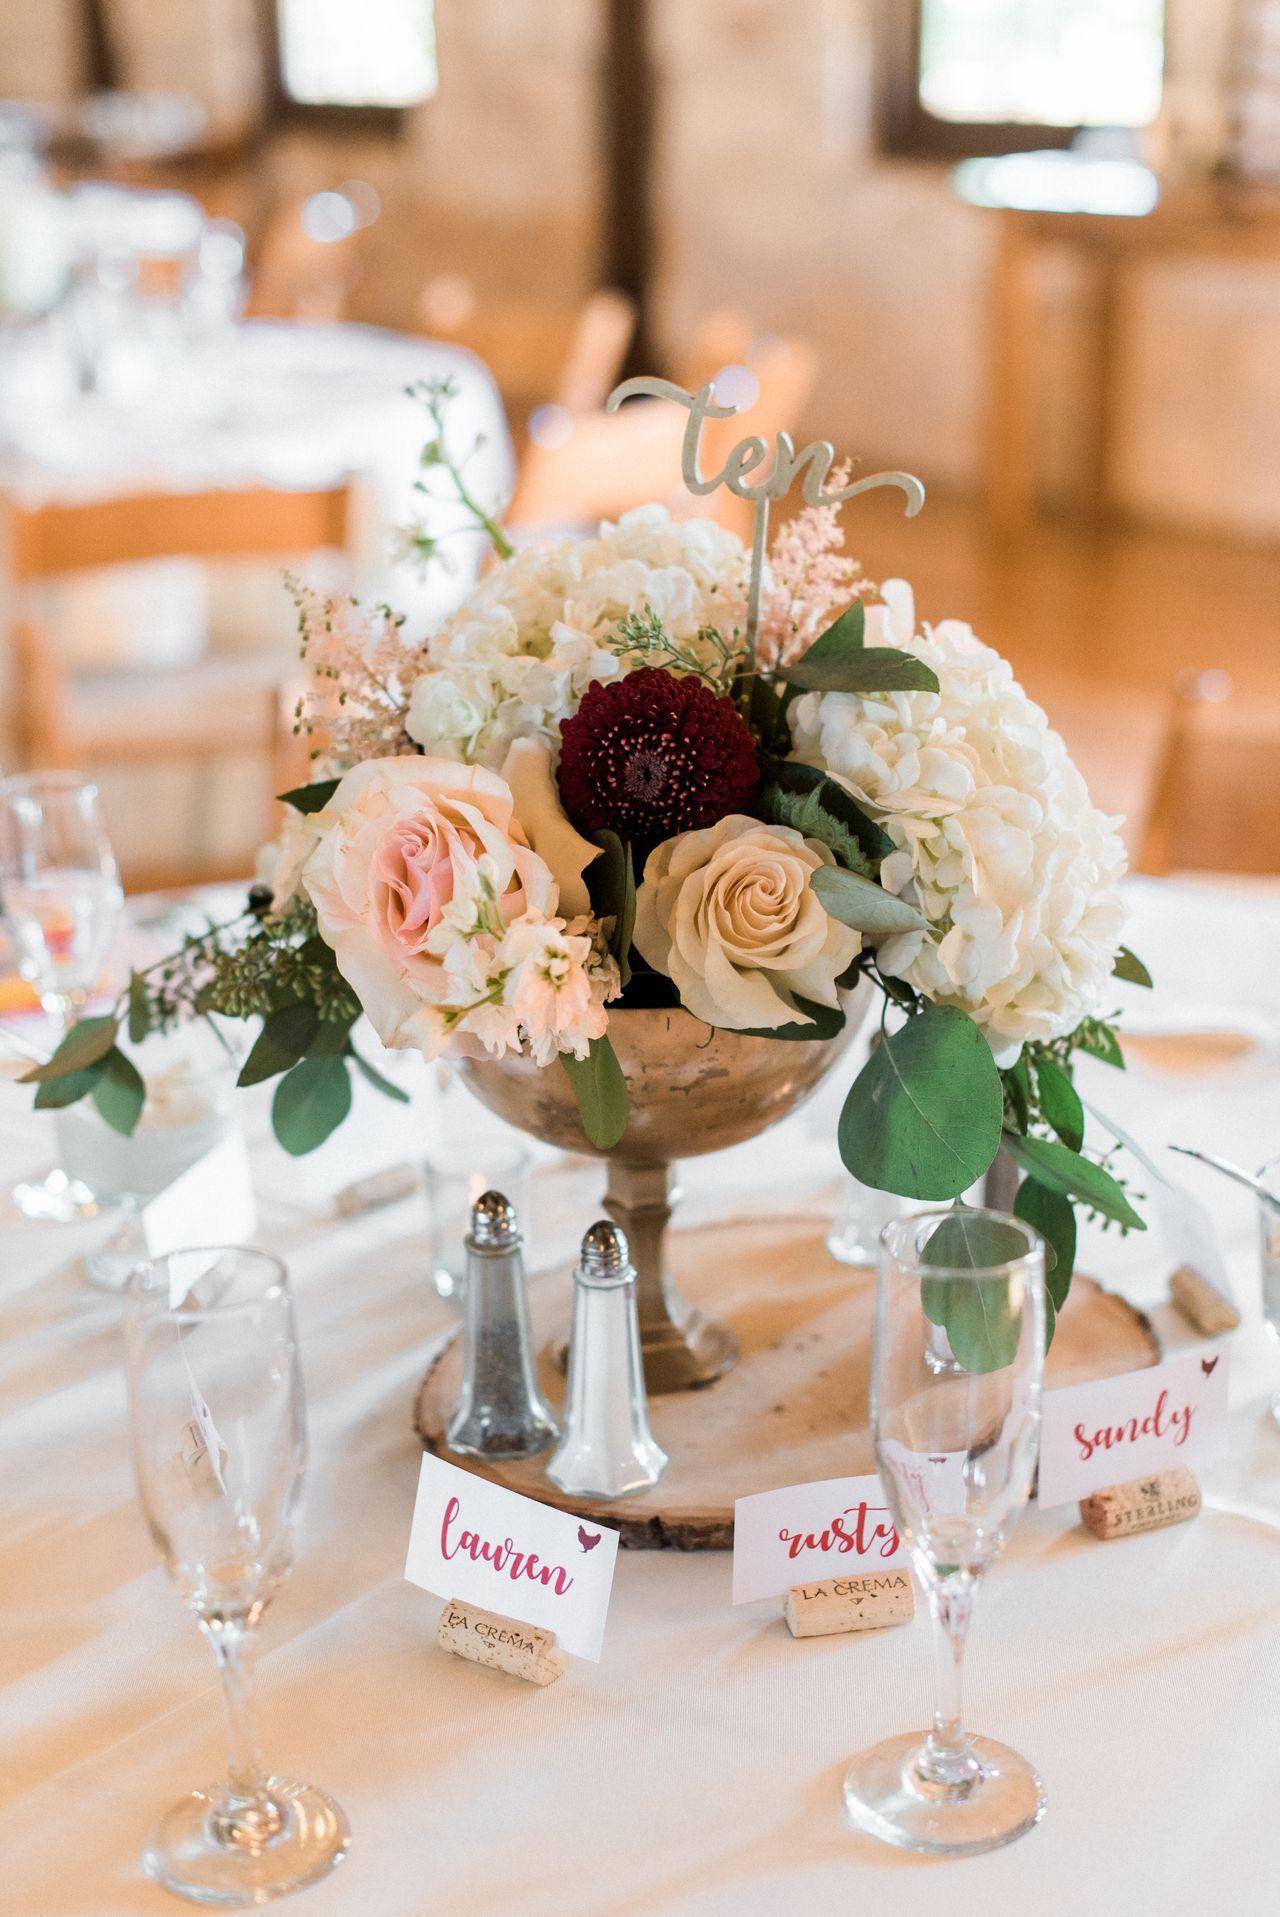 The Springs In Mckinney Rose Gold Wedding Table Wedding Table Centerpieces Wedding Table Decorations